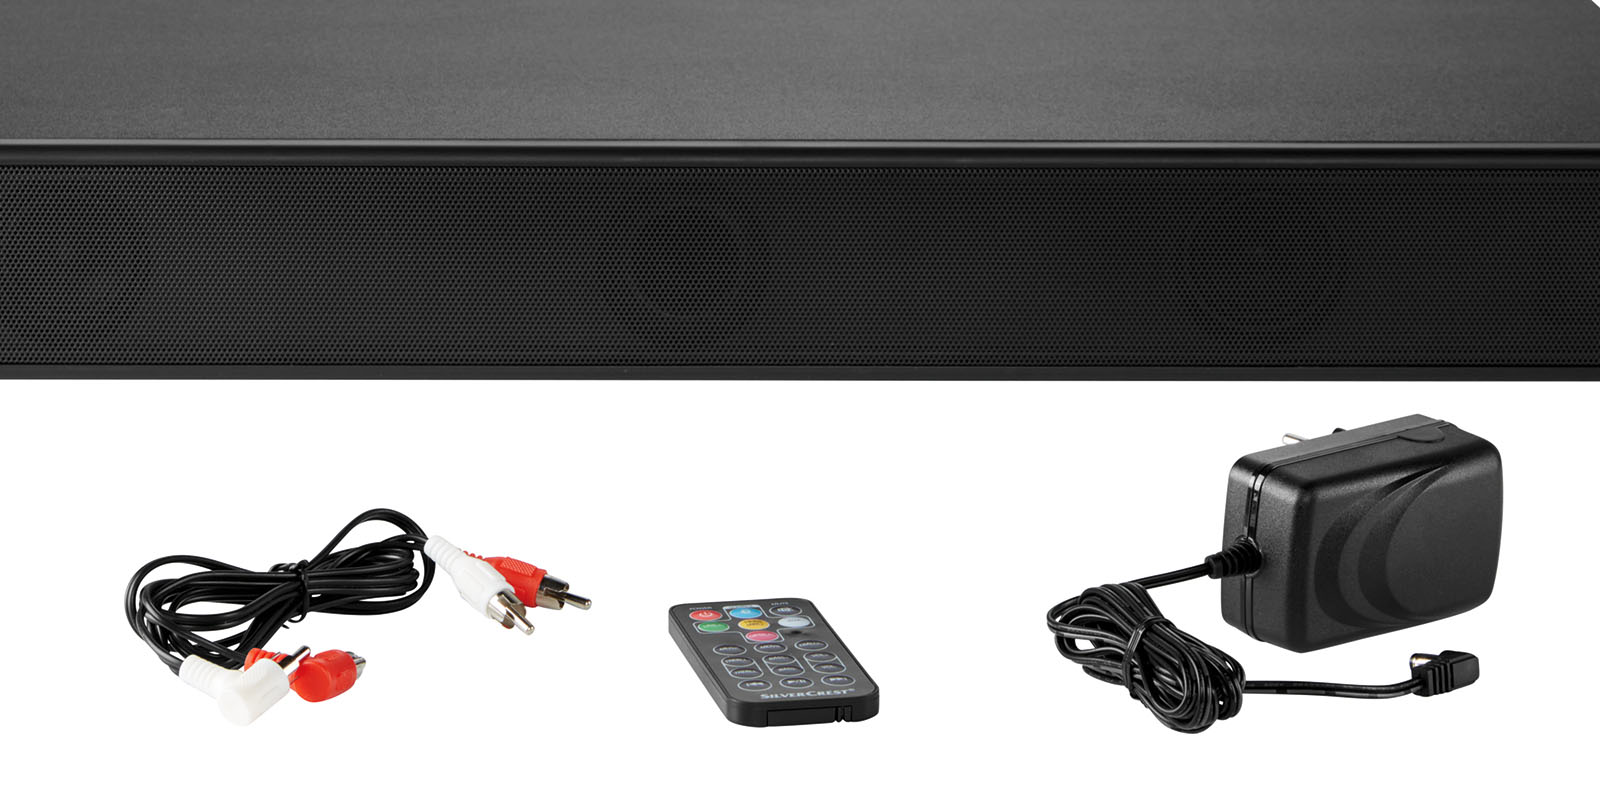 tv soundbase mit bluetooth lautsprecher silvercrest ebay. Black Bedroom Furniture Sets. Home Design Ideas